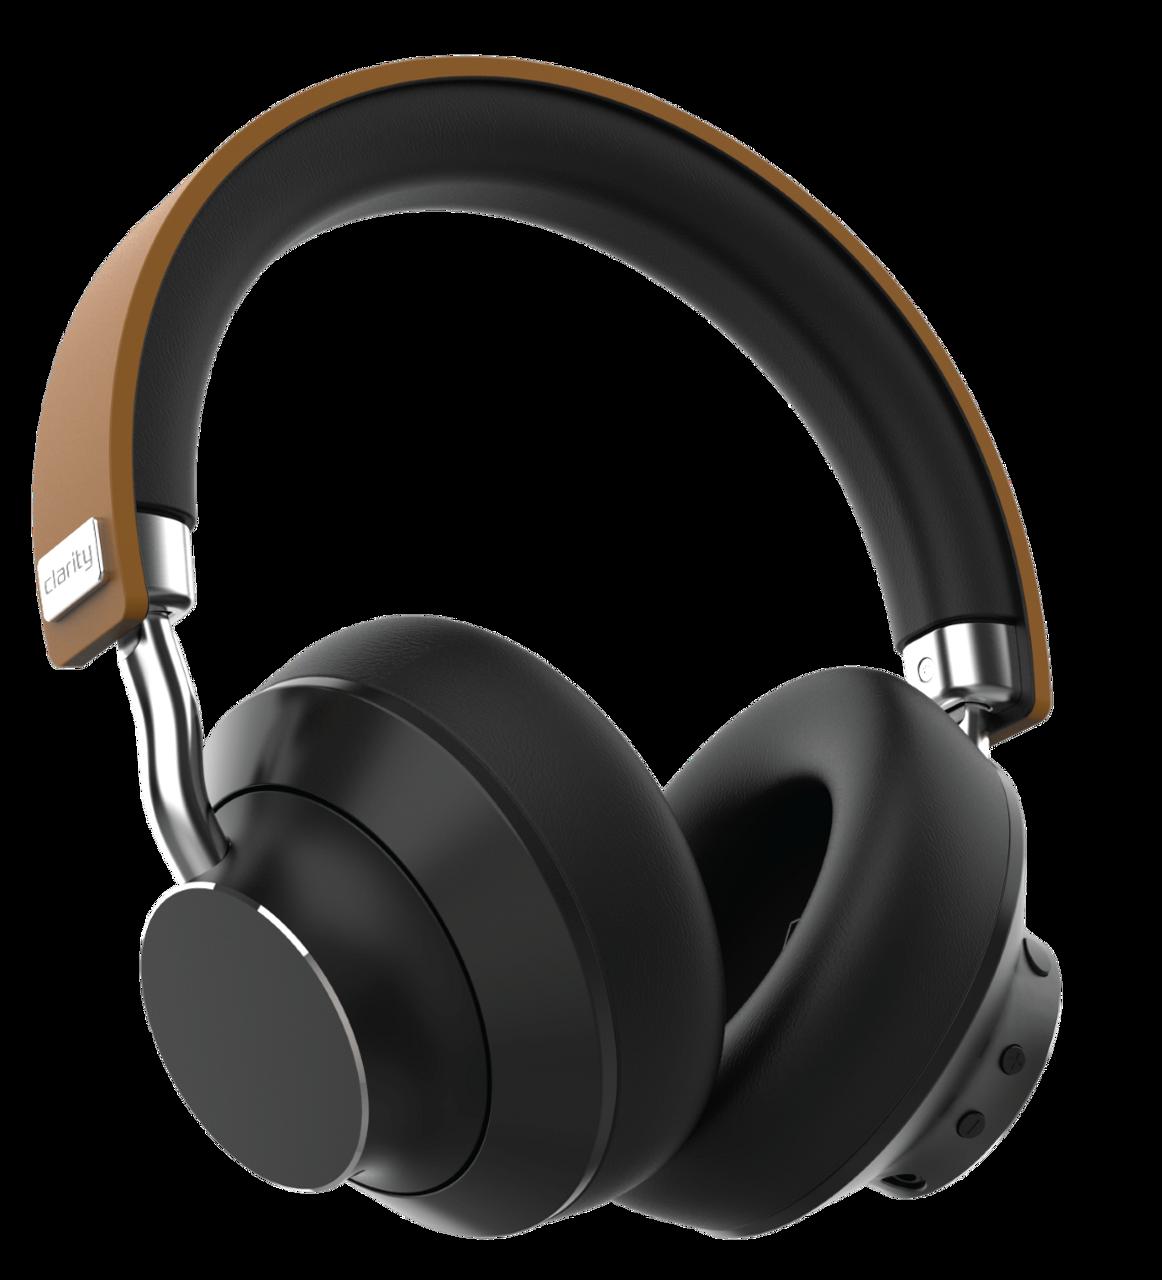 Clarity Amplified Headphone